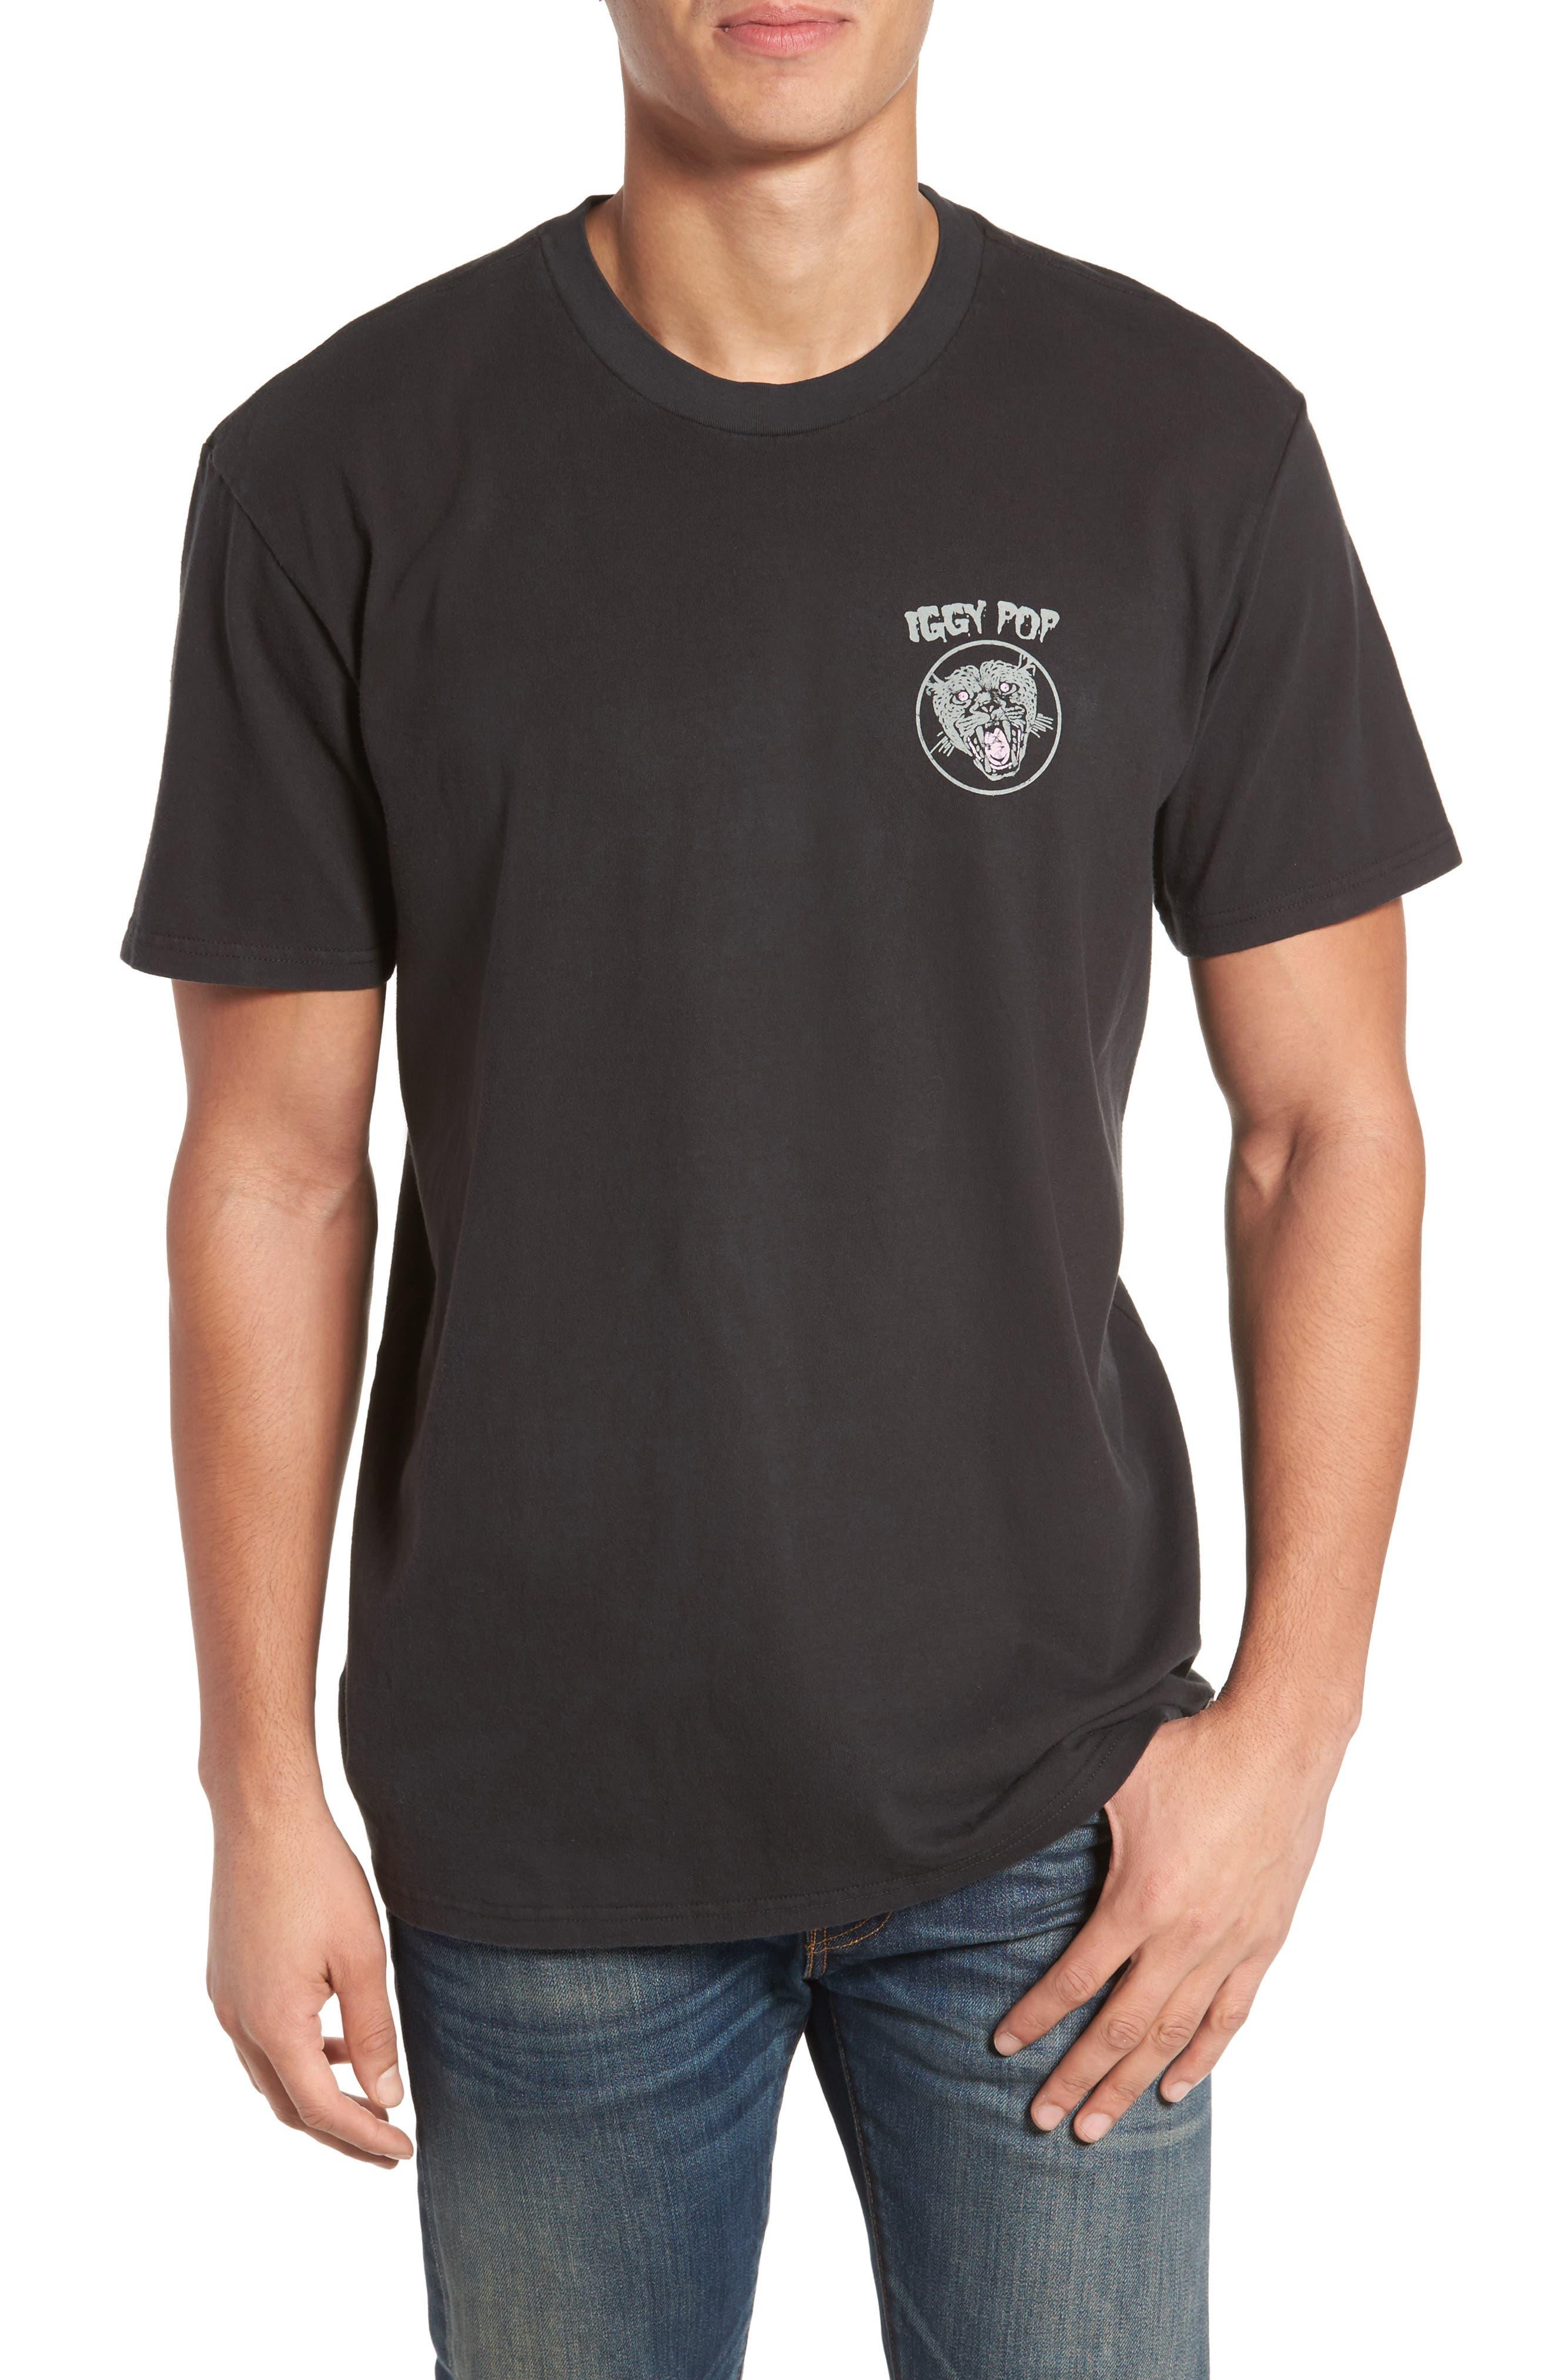 Main Image - Billabong x Iggy Pop Iggy Stack T-Shirt